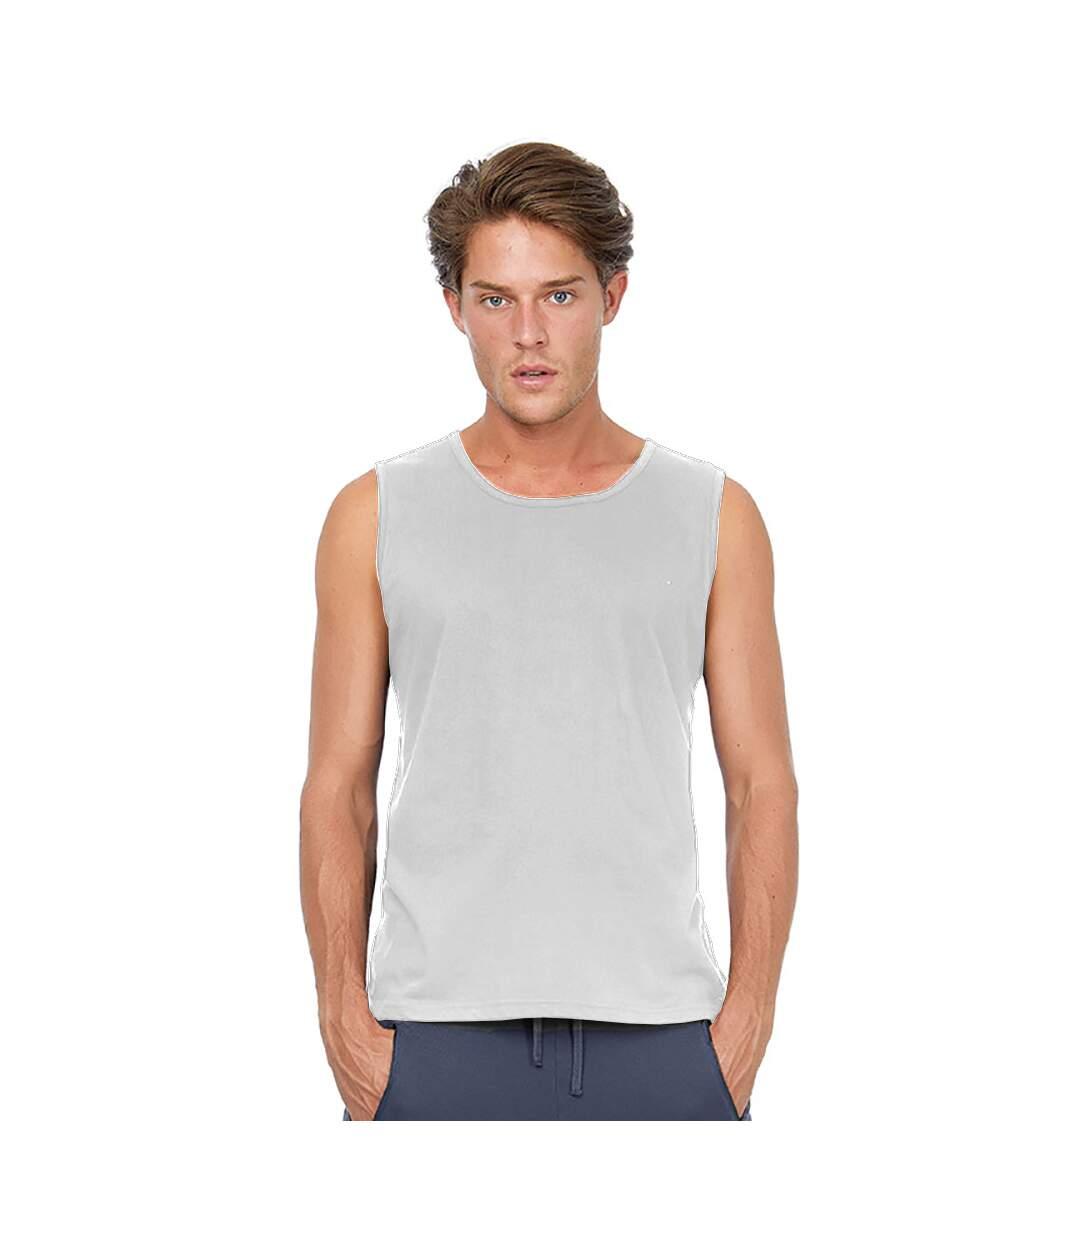 B&C Mens Move Sleeveless Athletic Sports Vest Top (White) - UTRW3499